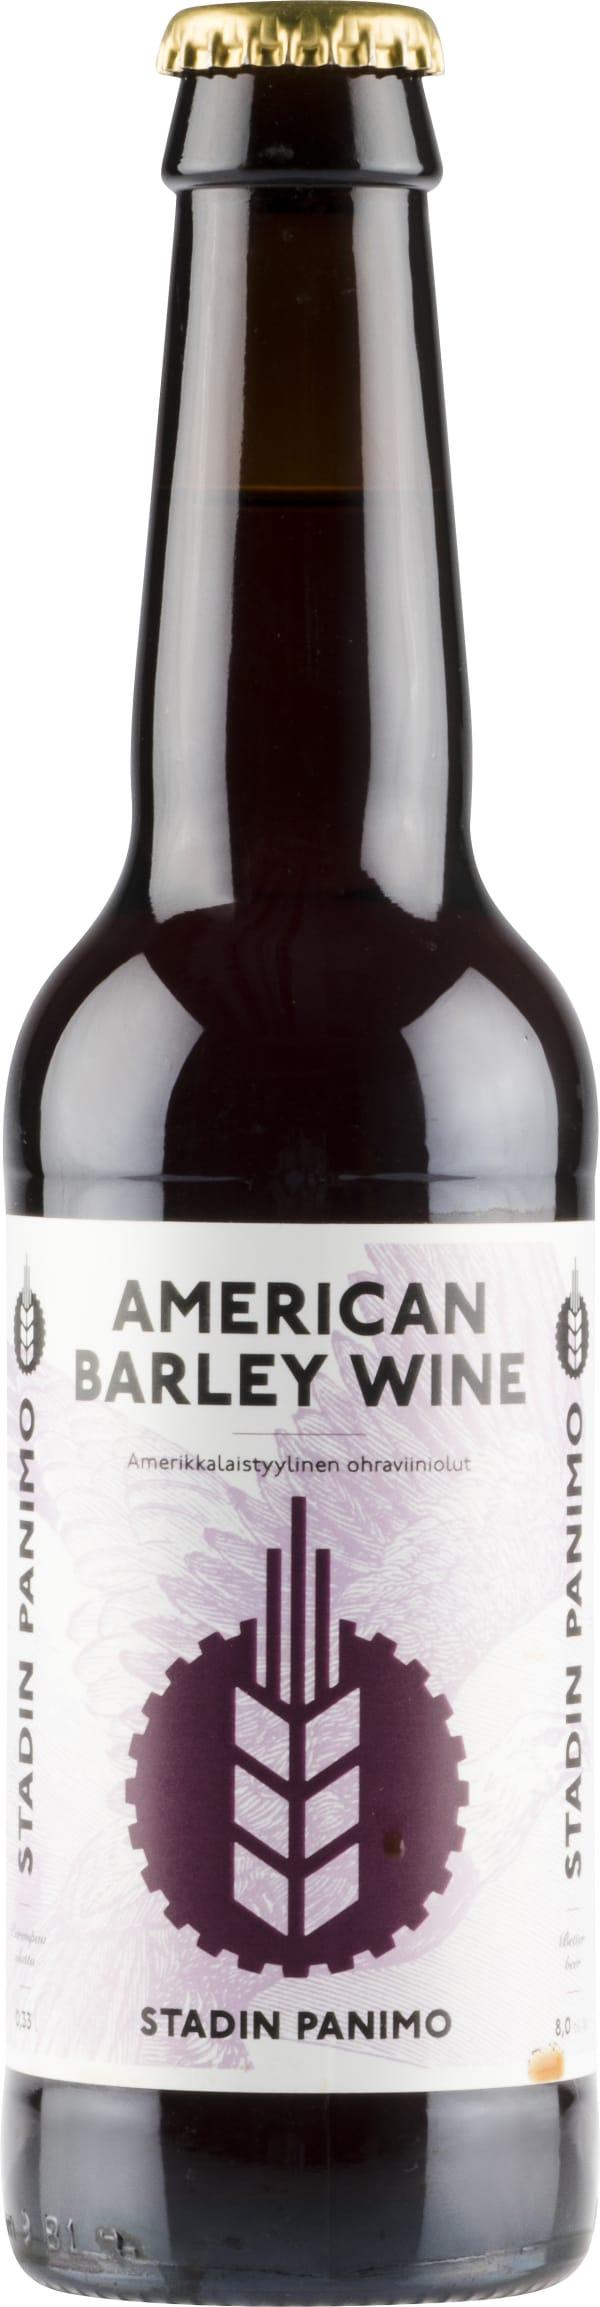 Stadin Panimo American Barley Wine